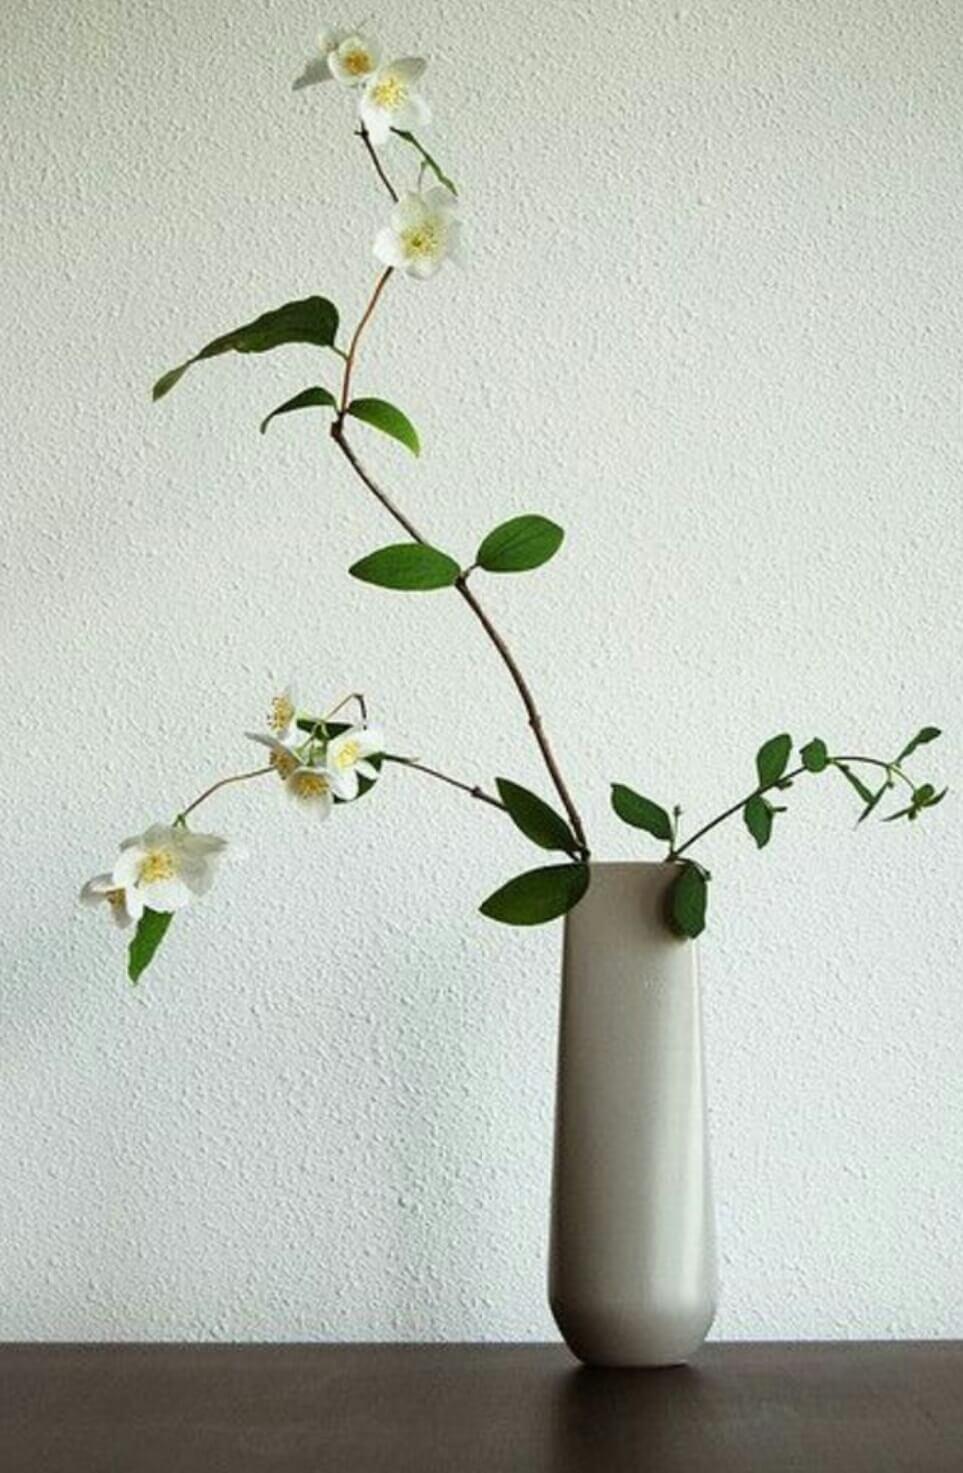 Vaso alto com ikebana